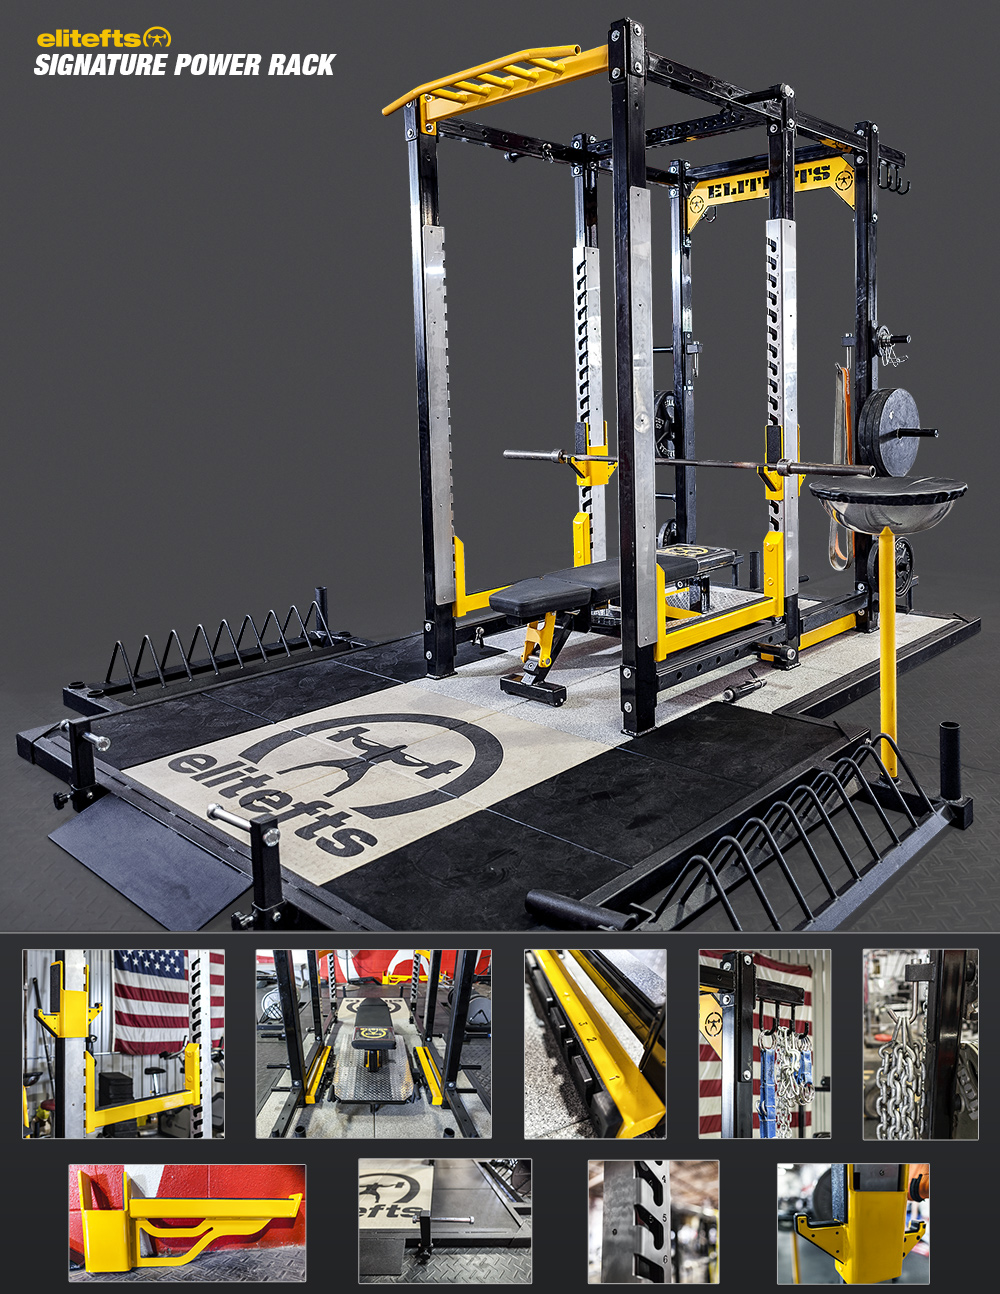 diy garage gym ideas - Client List Elite FTS